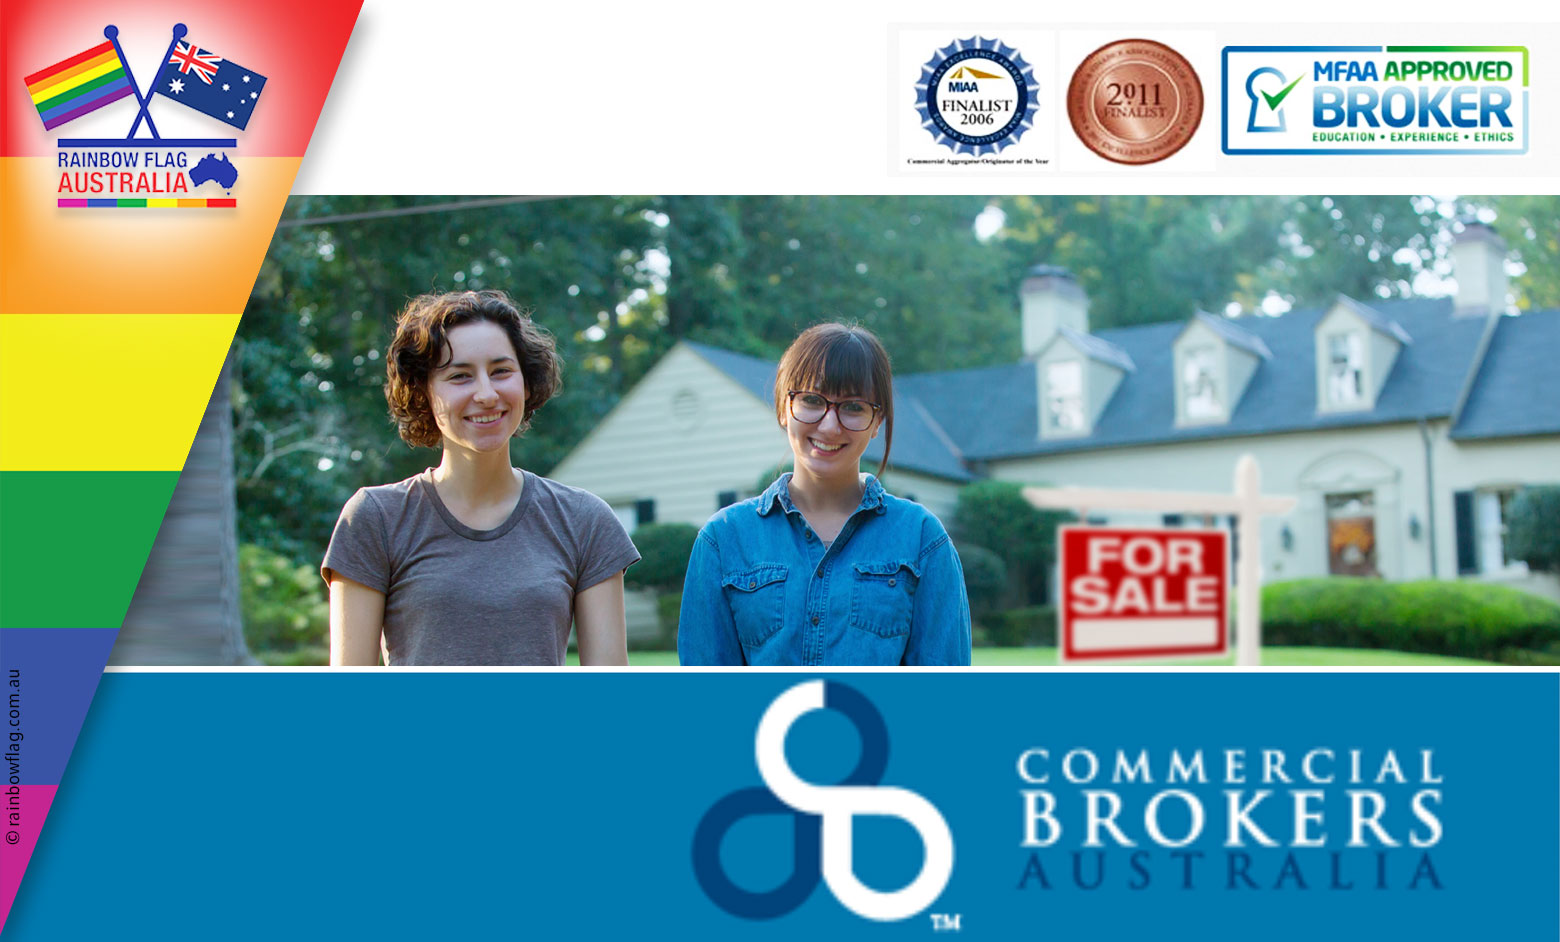 Commercial Brokers Australia